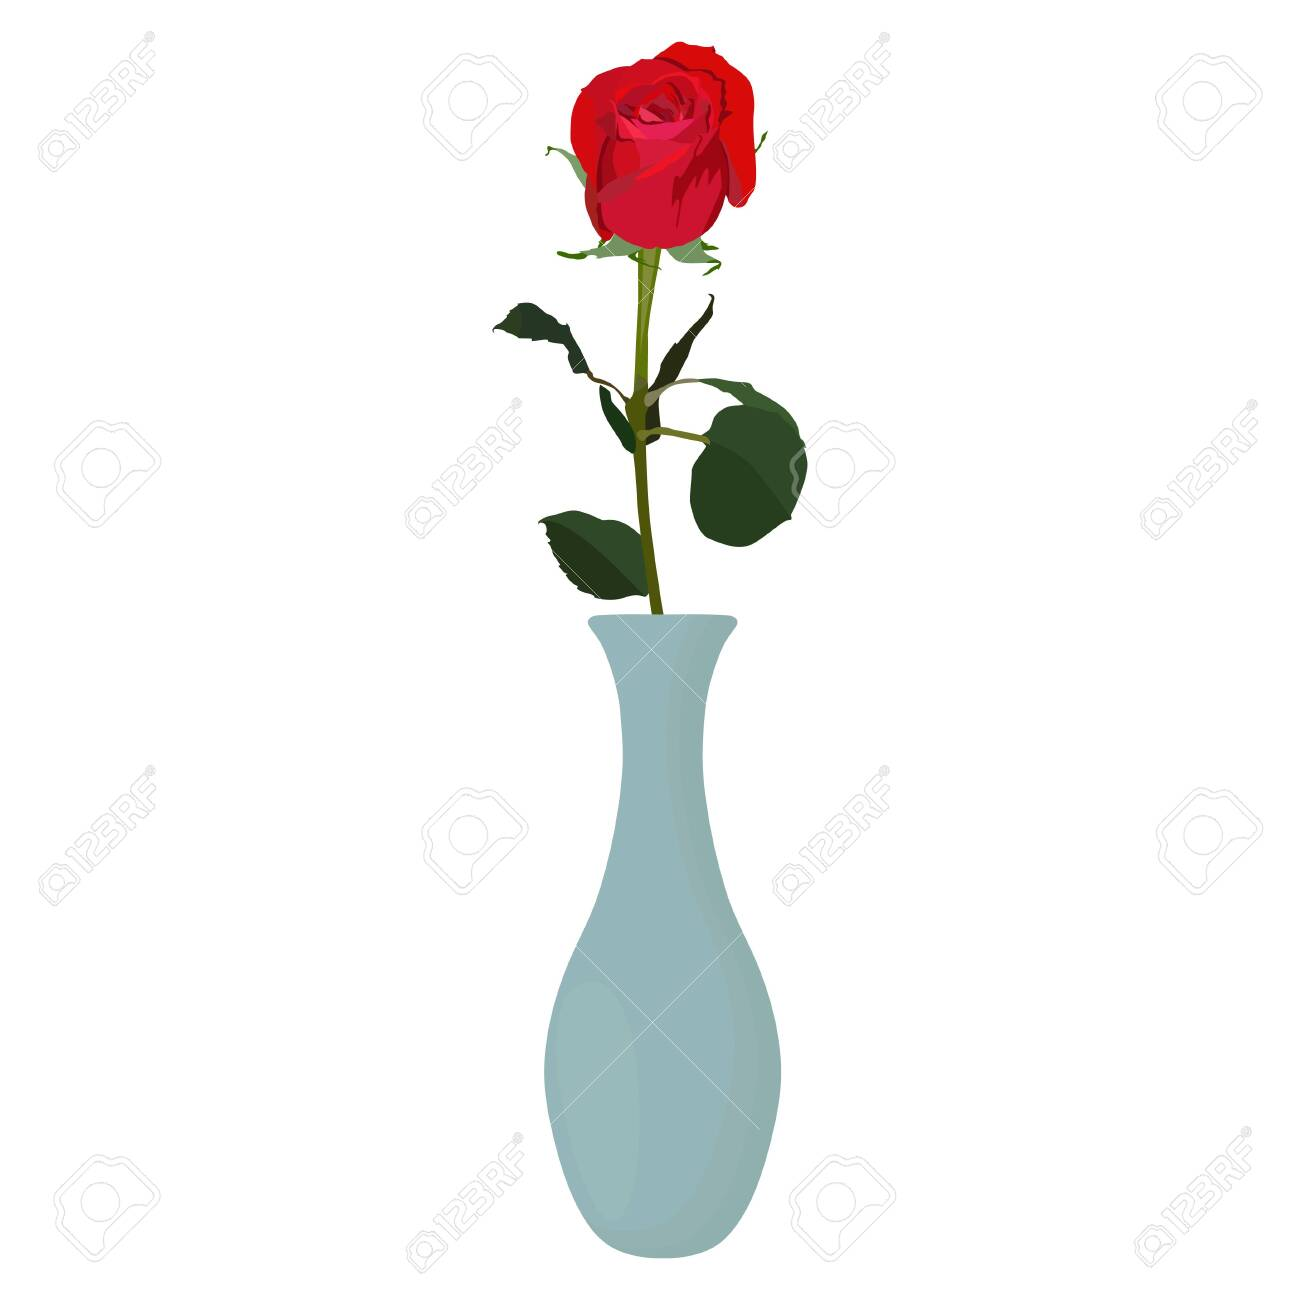 Flower Vase Vector on books vector, basket vector, art vector, box vector, decor vector, candle vector, animals vector, roses vector, floral vector, pottery vector, mirror vector, beer mug vector, teapot vector,